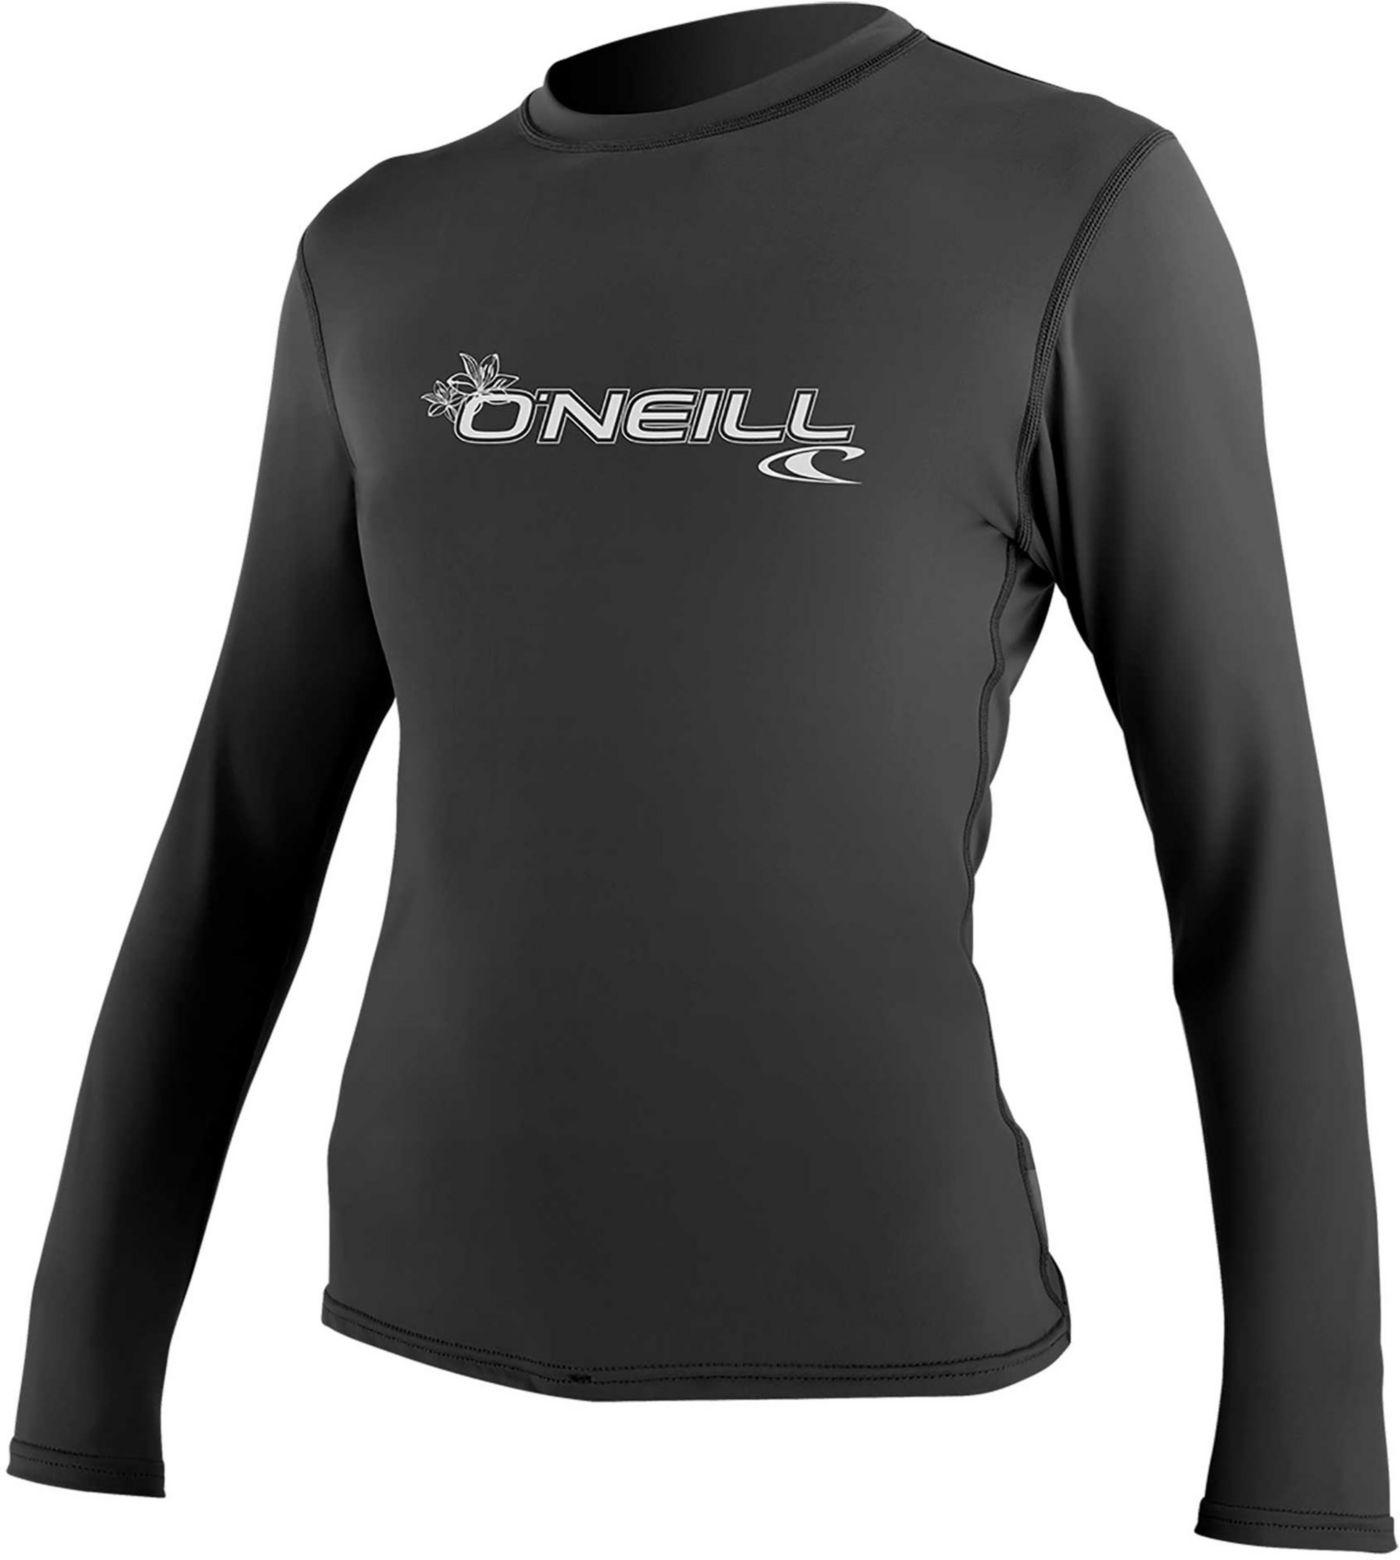 O'Neill Women's Basic Long Sleeve Rash Guard